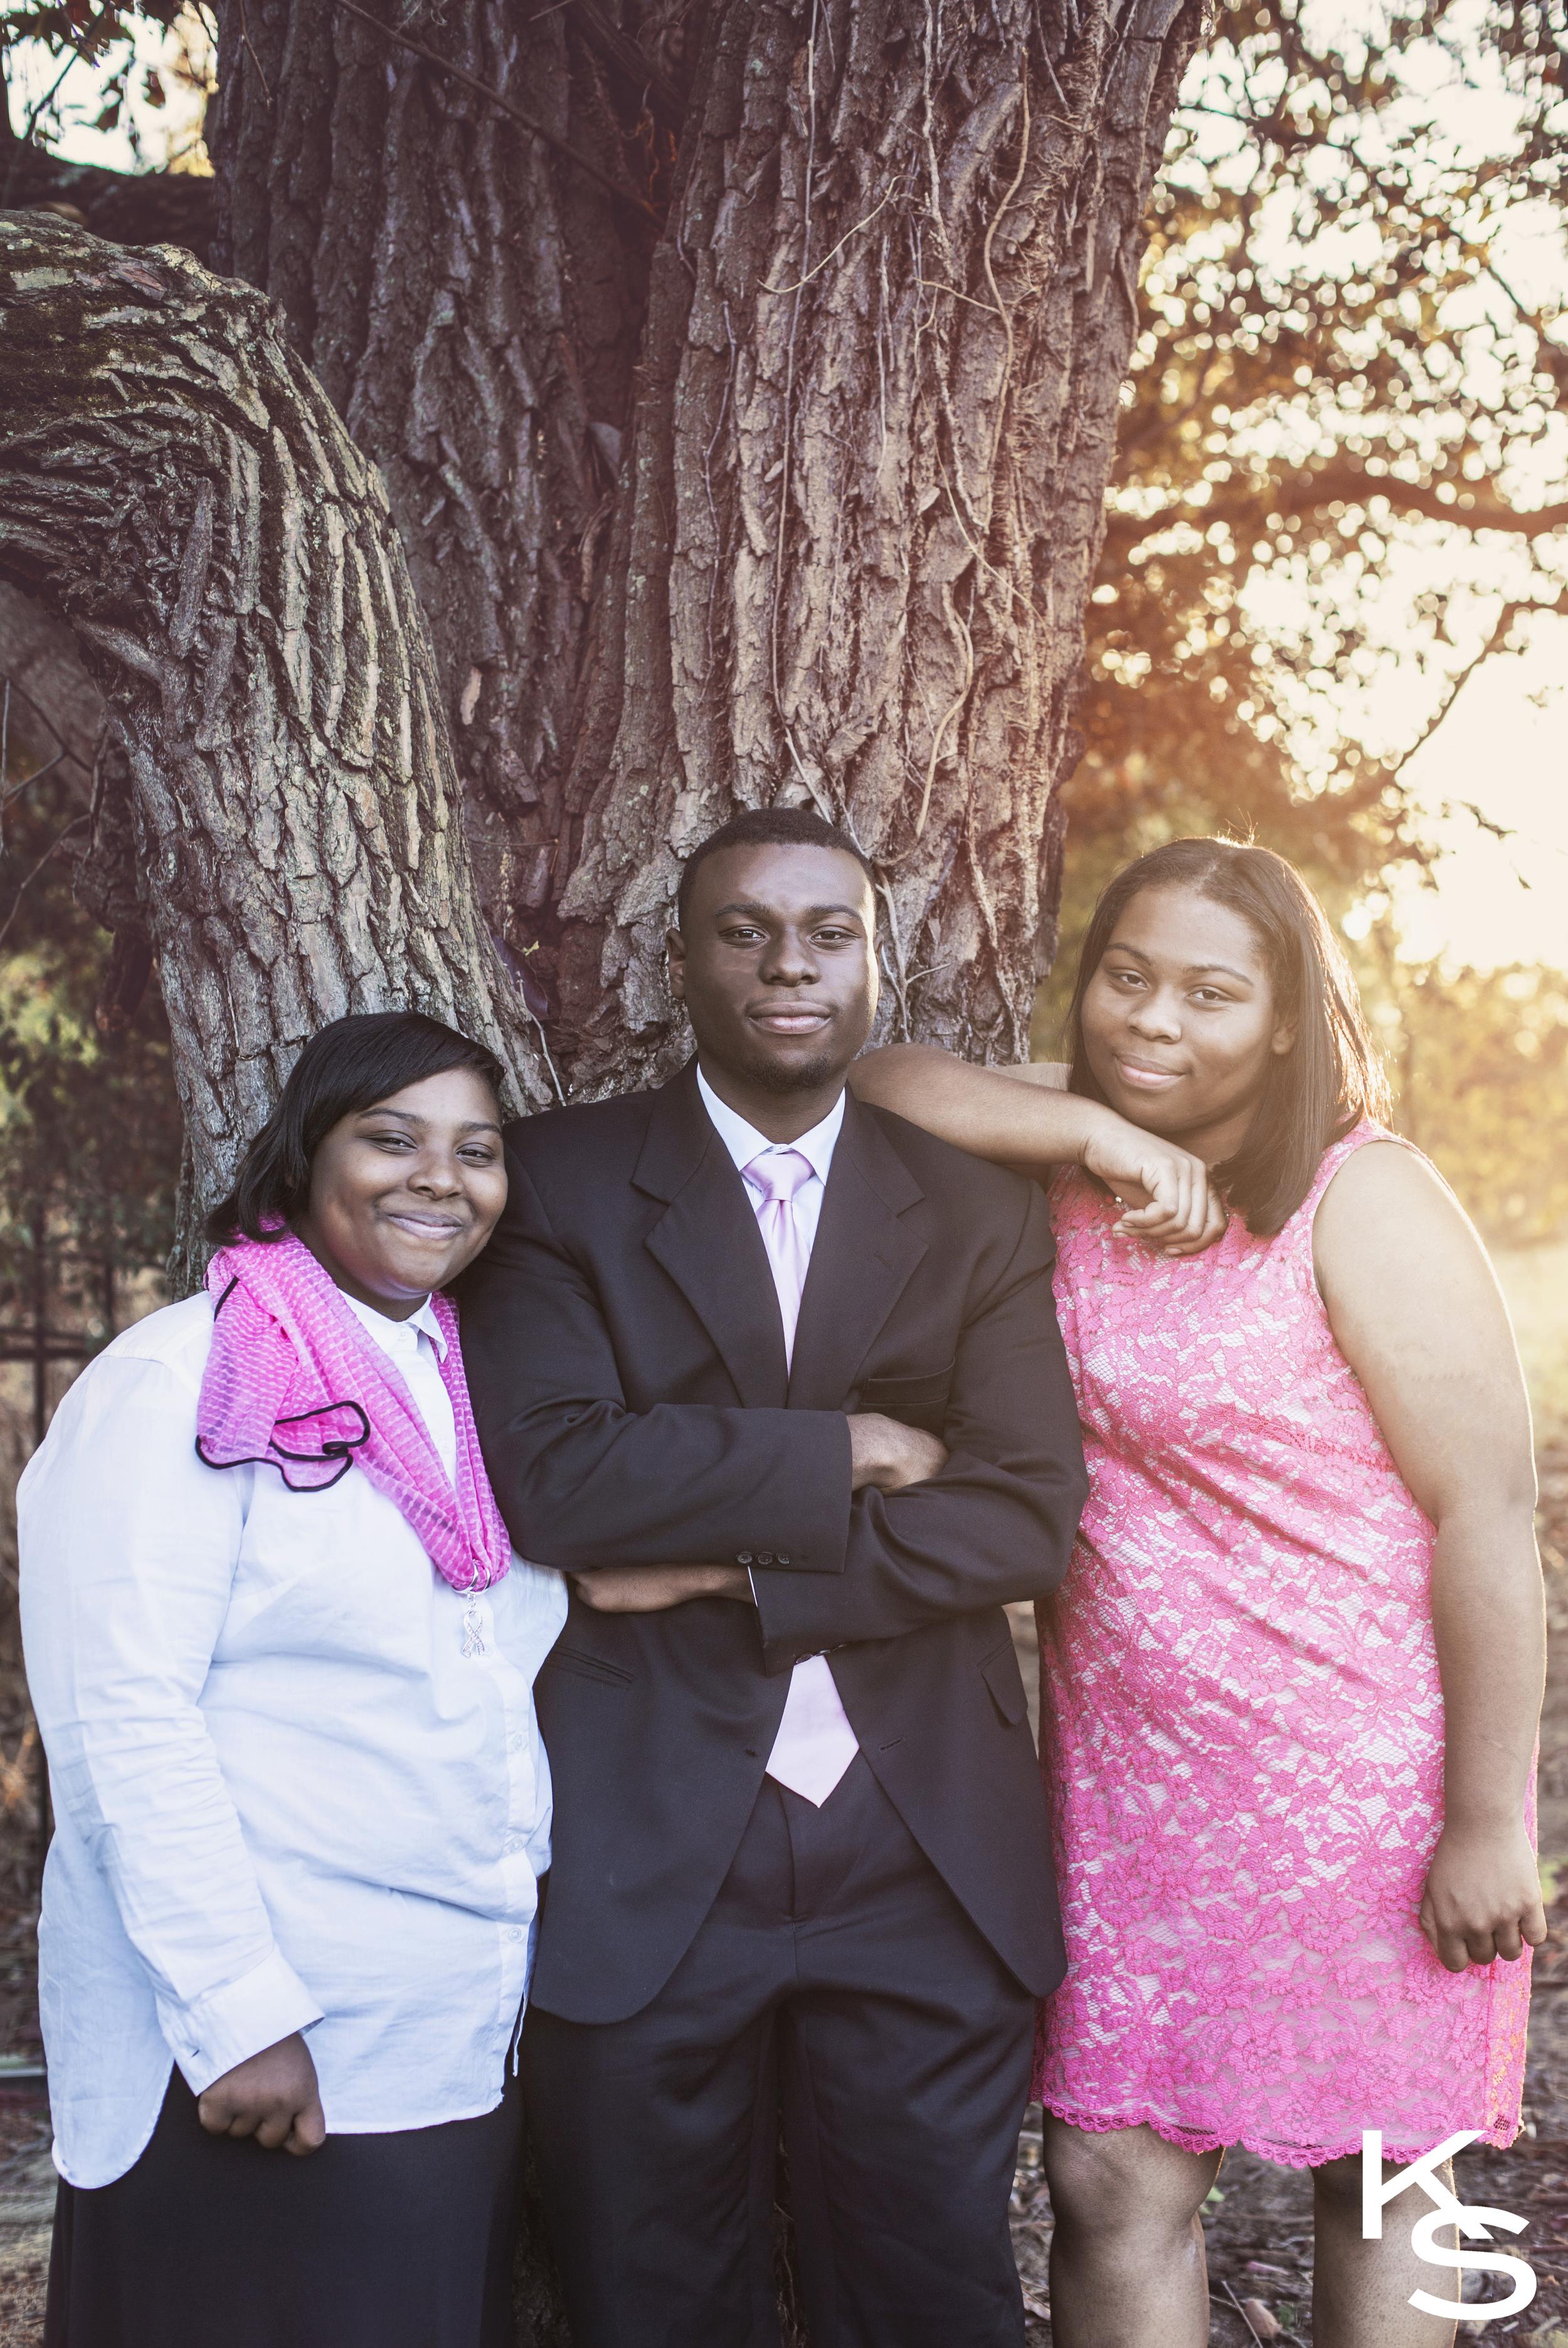 Fields Family - Portraits - K. Stoddard Photography 012.jpg